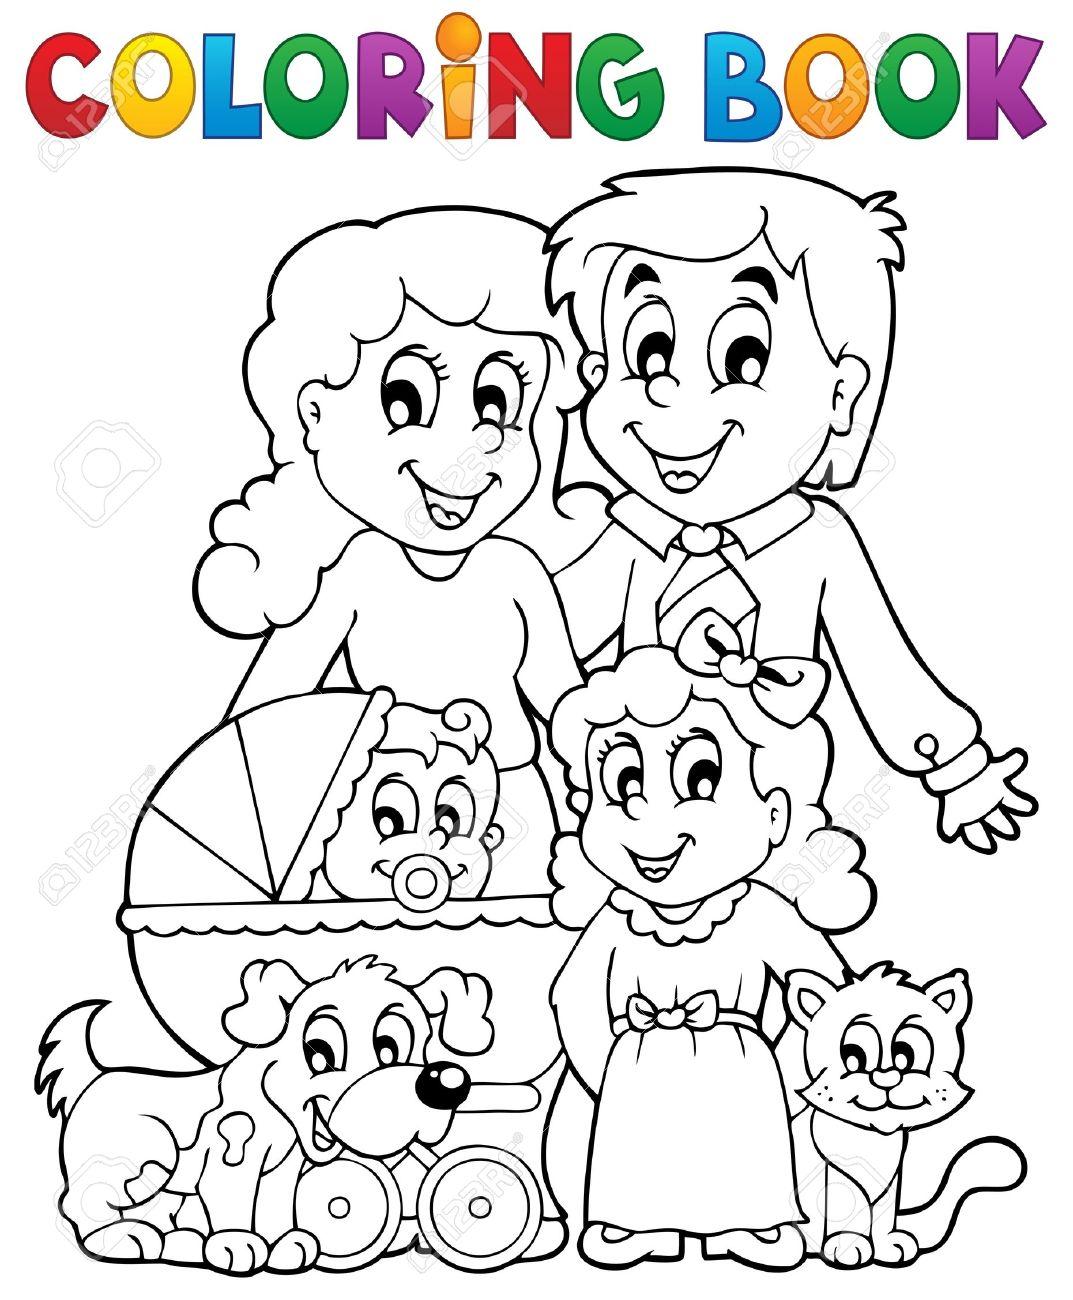 Coloring Book Family Theme Stock Vector